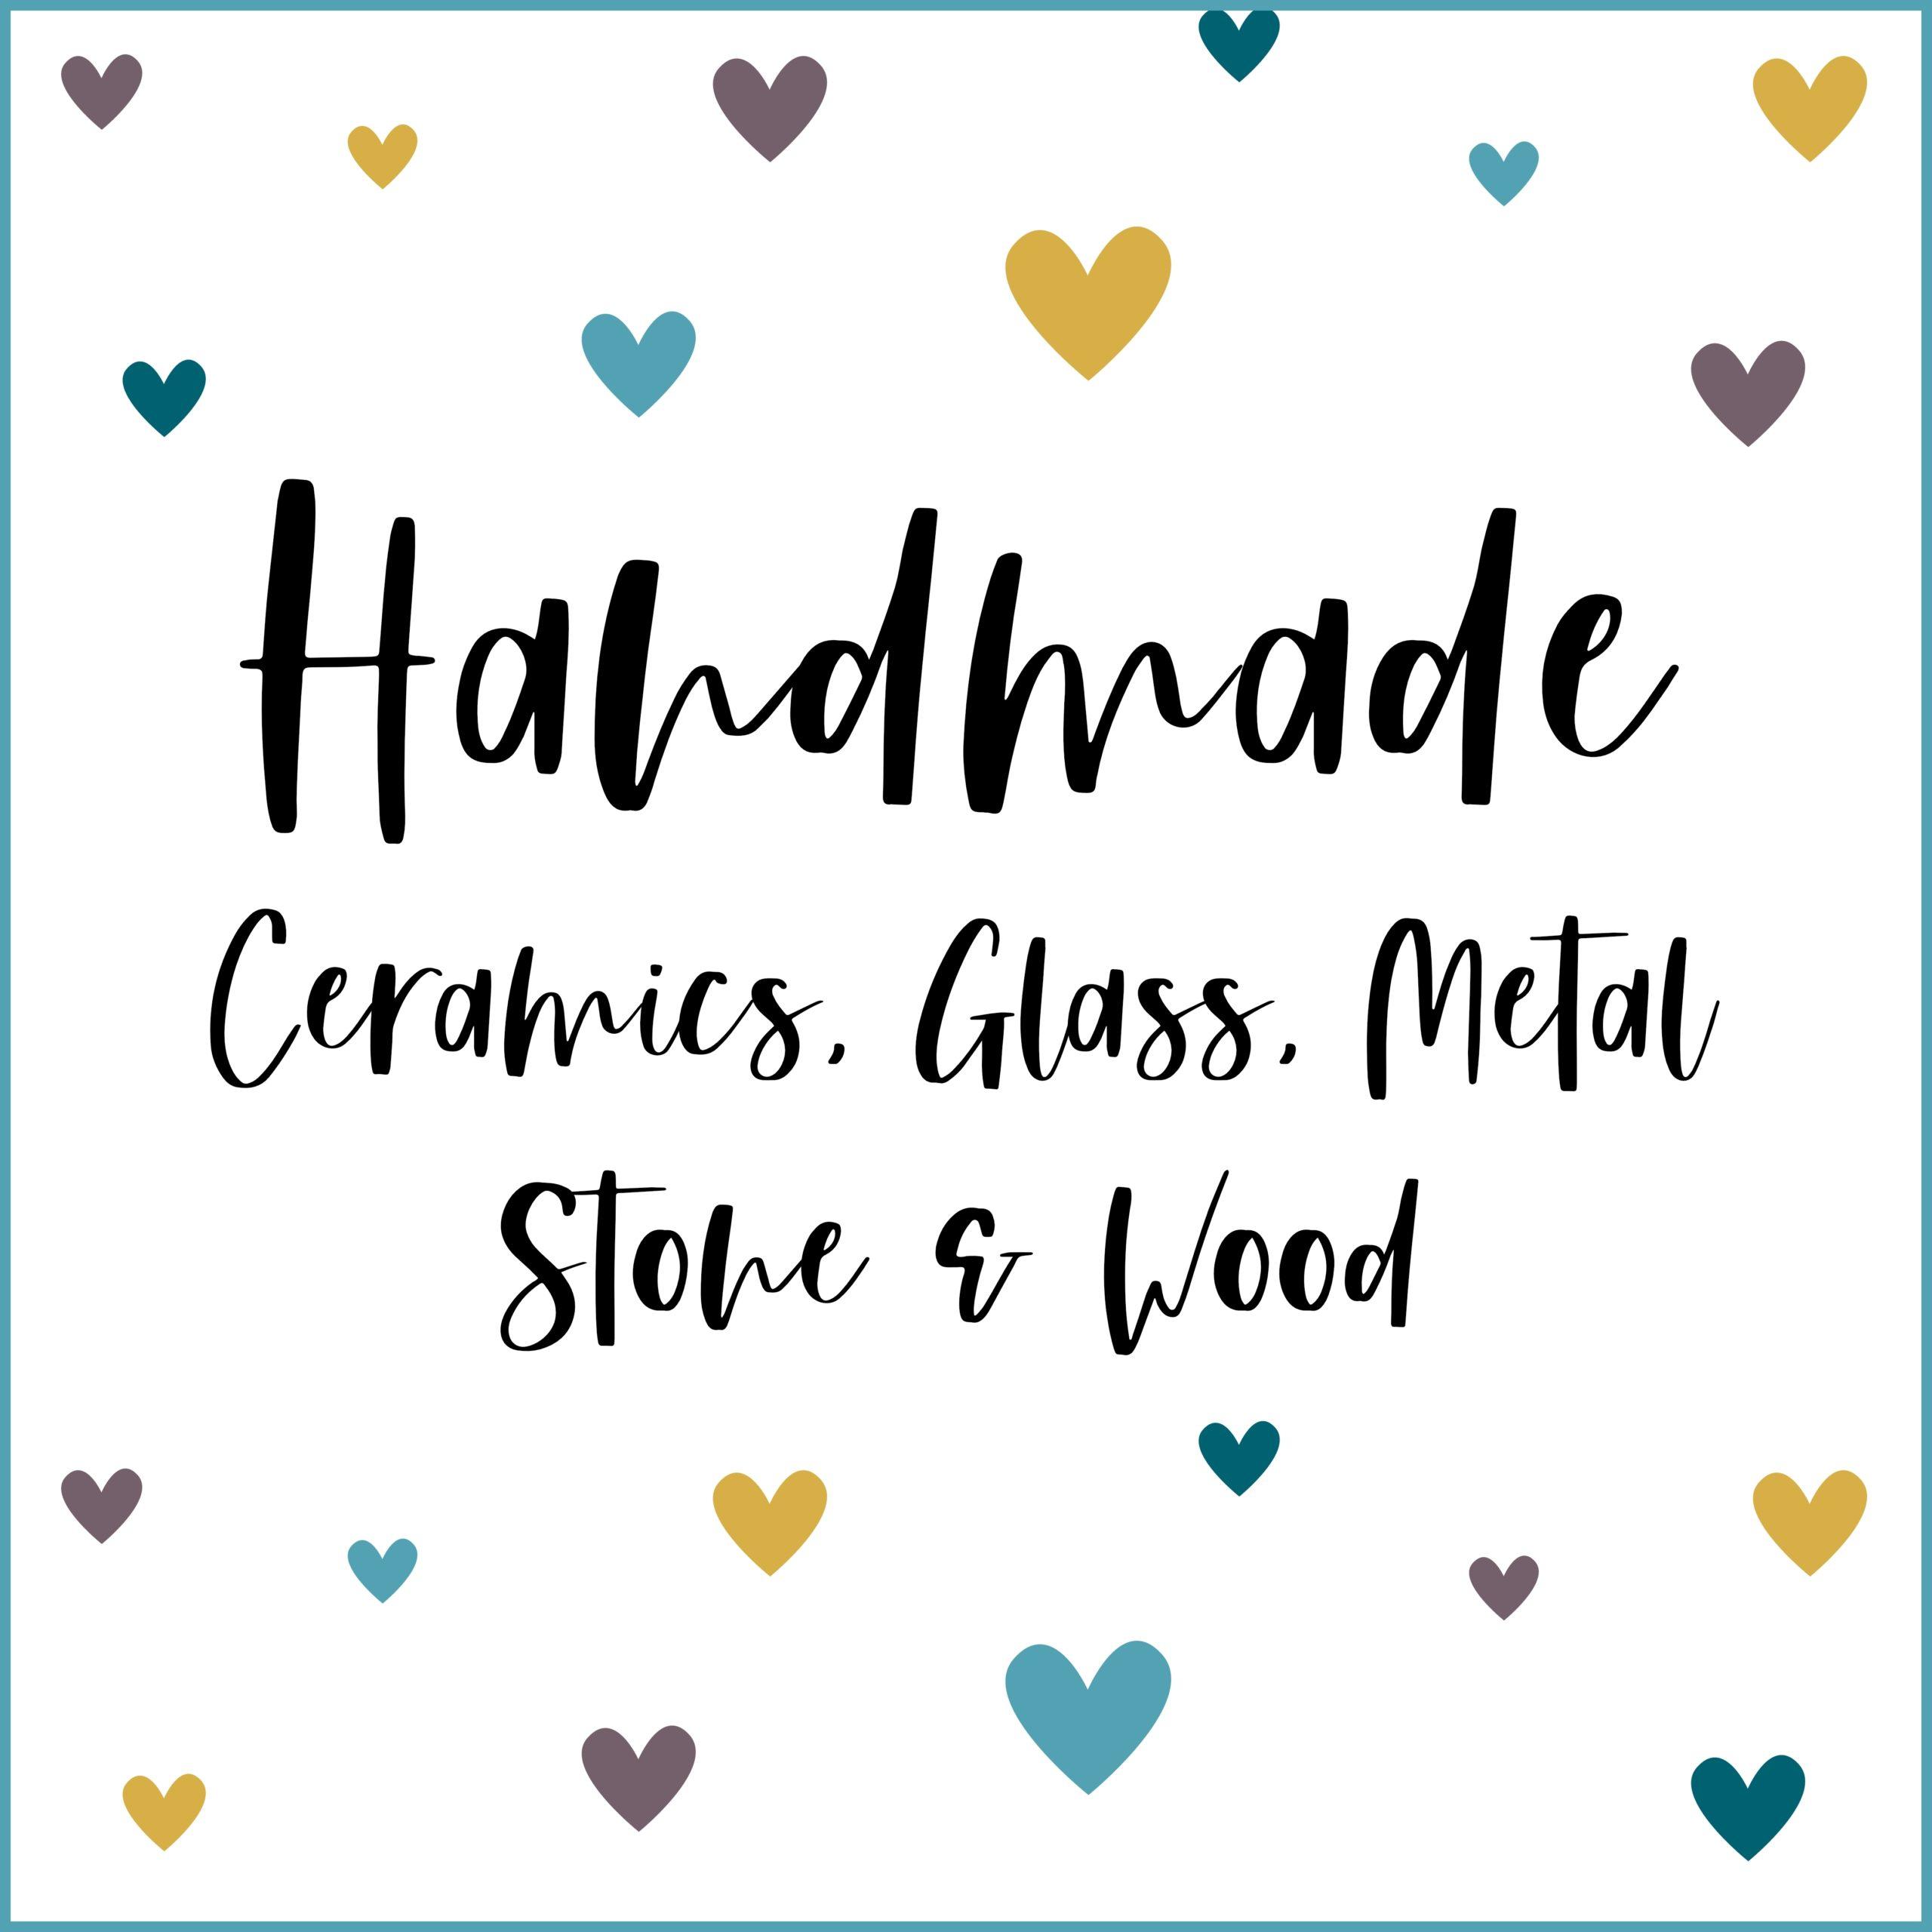 Handmade - Ceramics, Glass, Metal, Stone & Wood